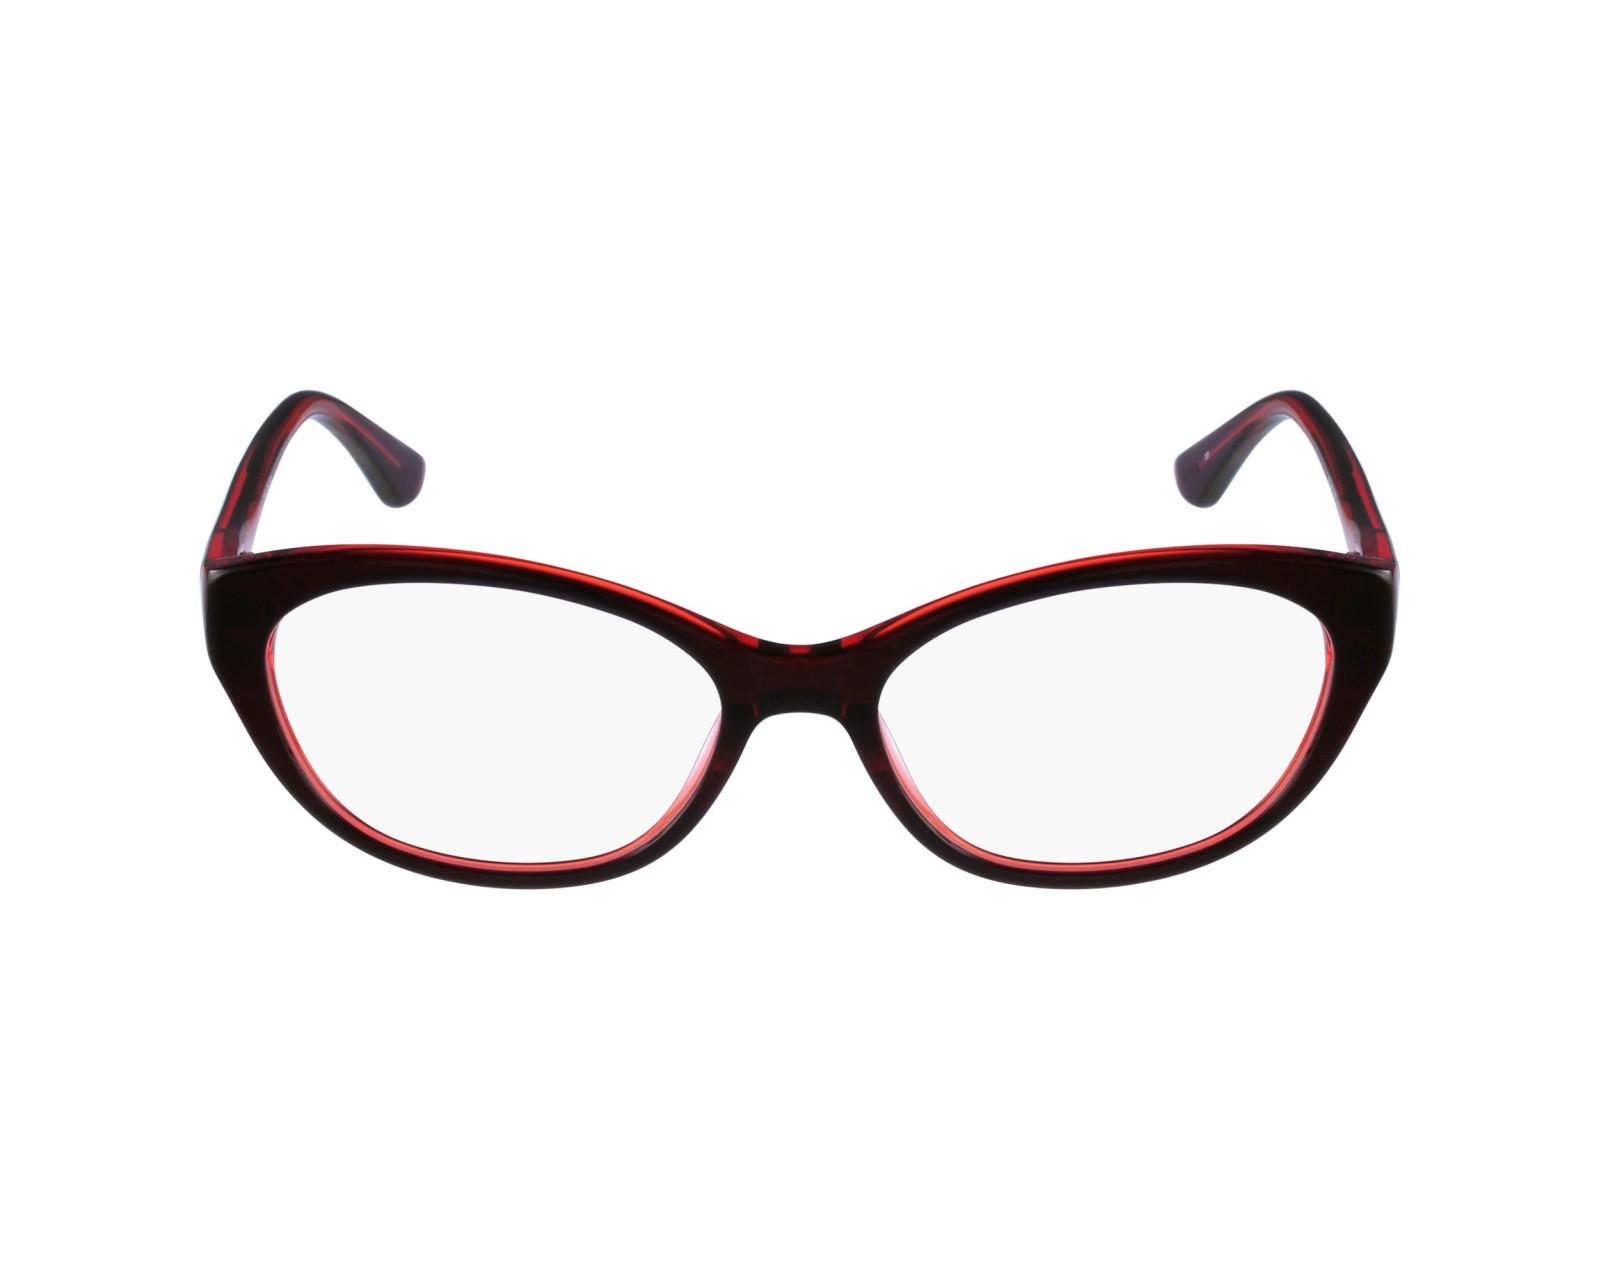 Order your Guess eyeglasses GU2468 BURD 52 today